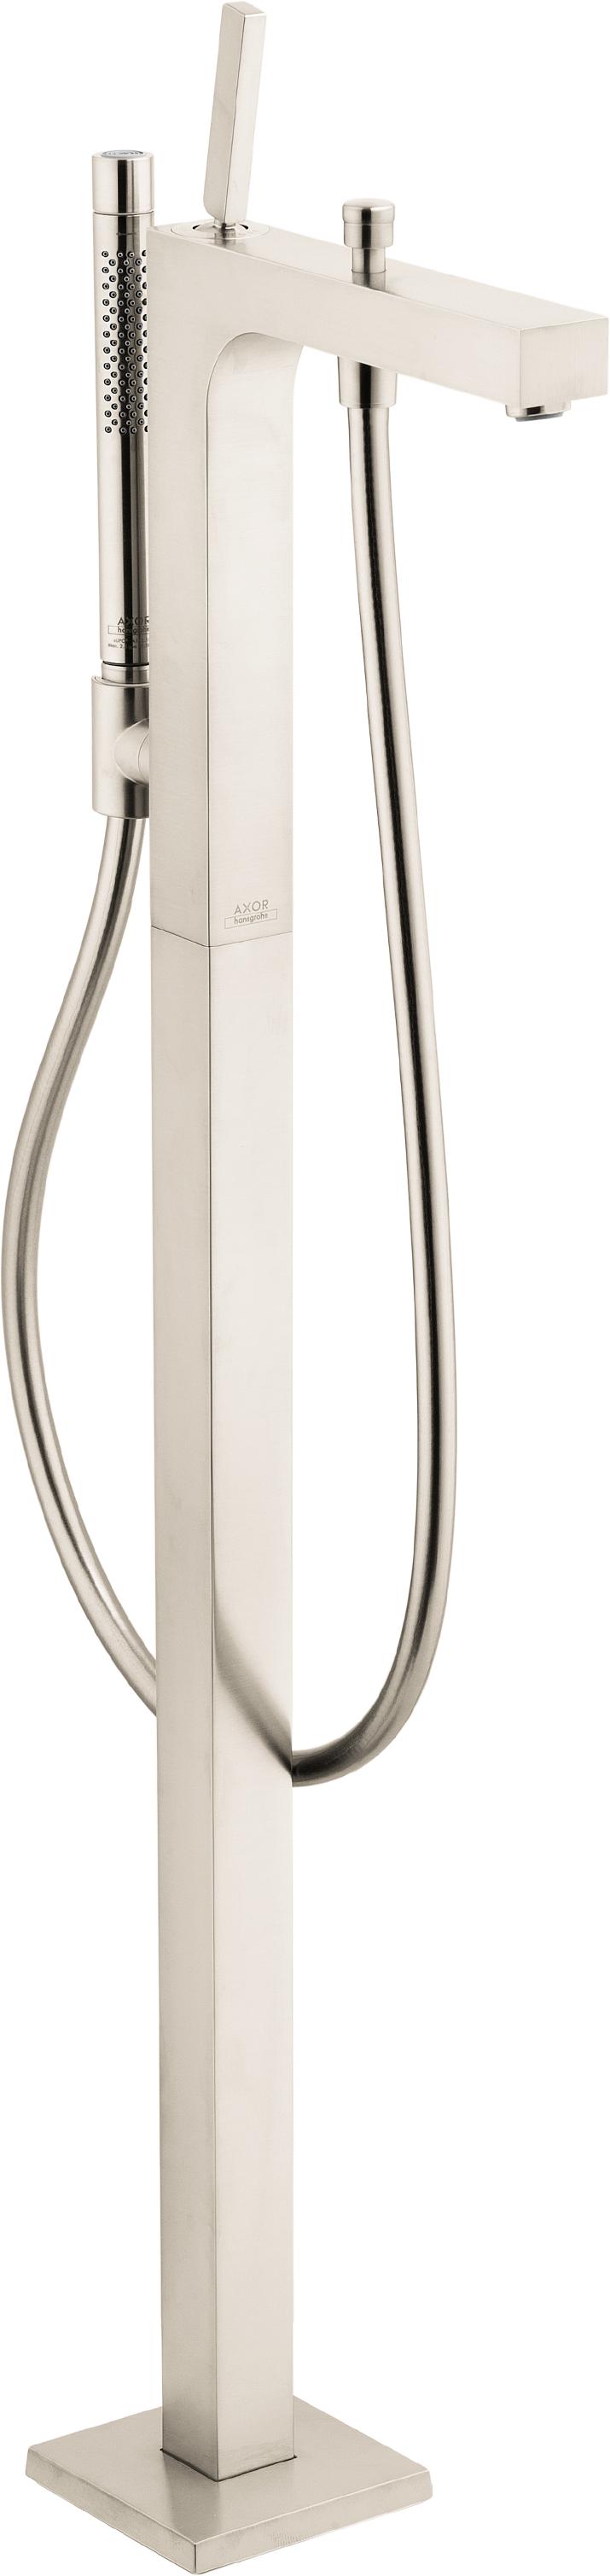 Axor AXOR Citterio Freestanding Tub Filler Trim with 1.75 GPM Handshower